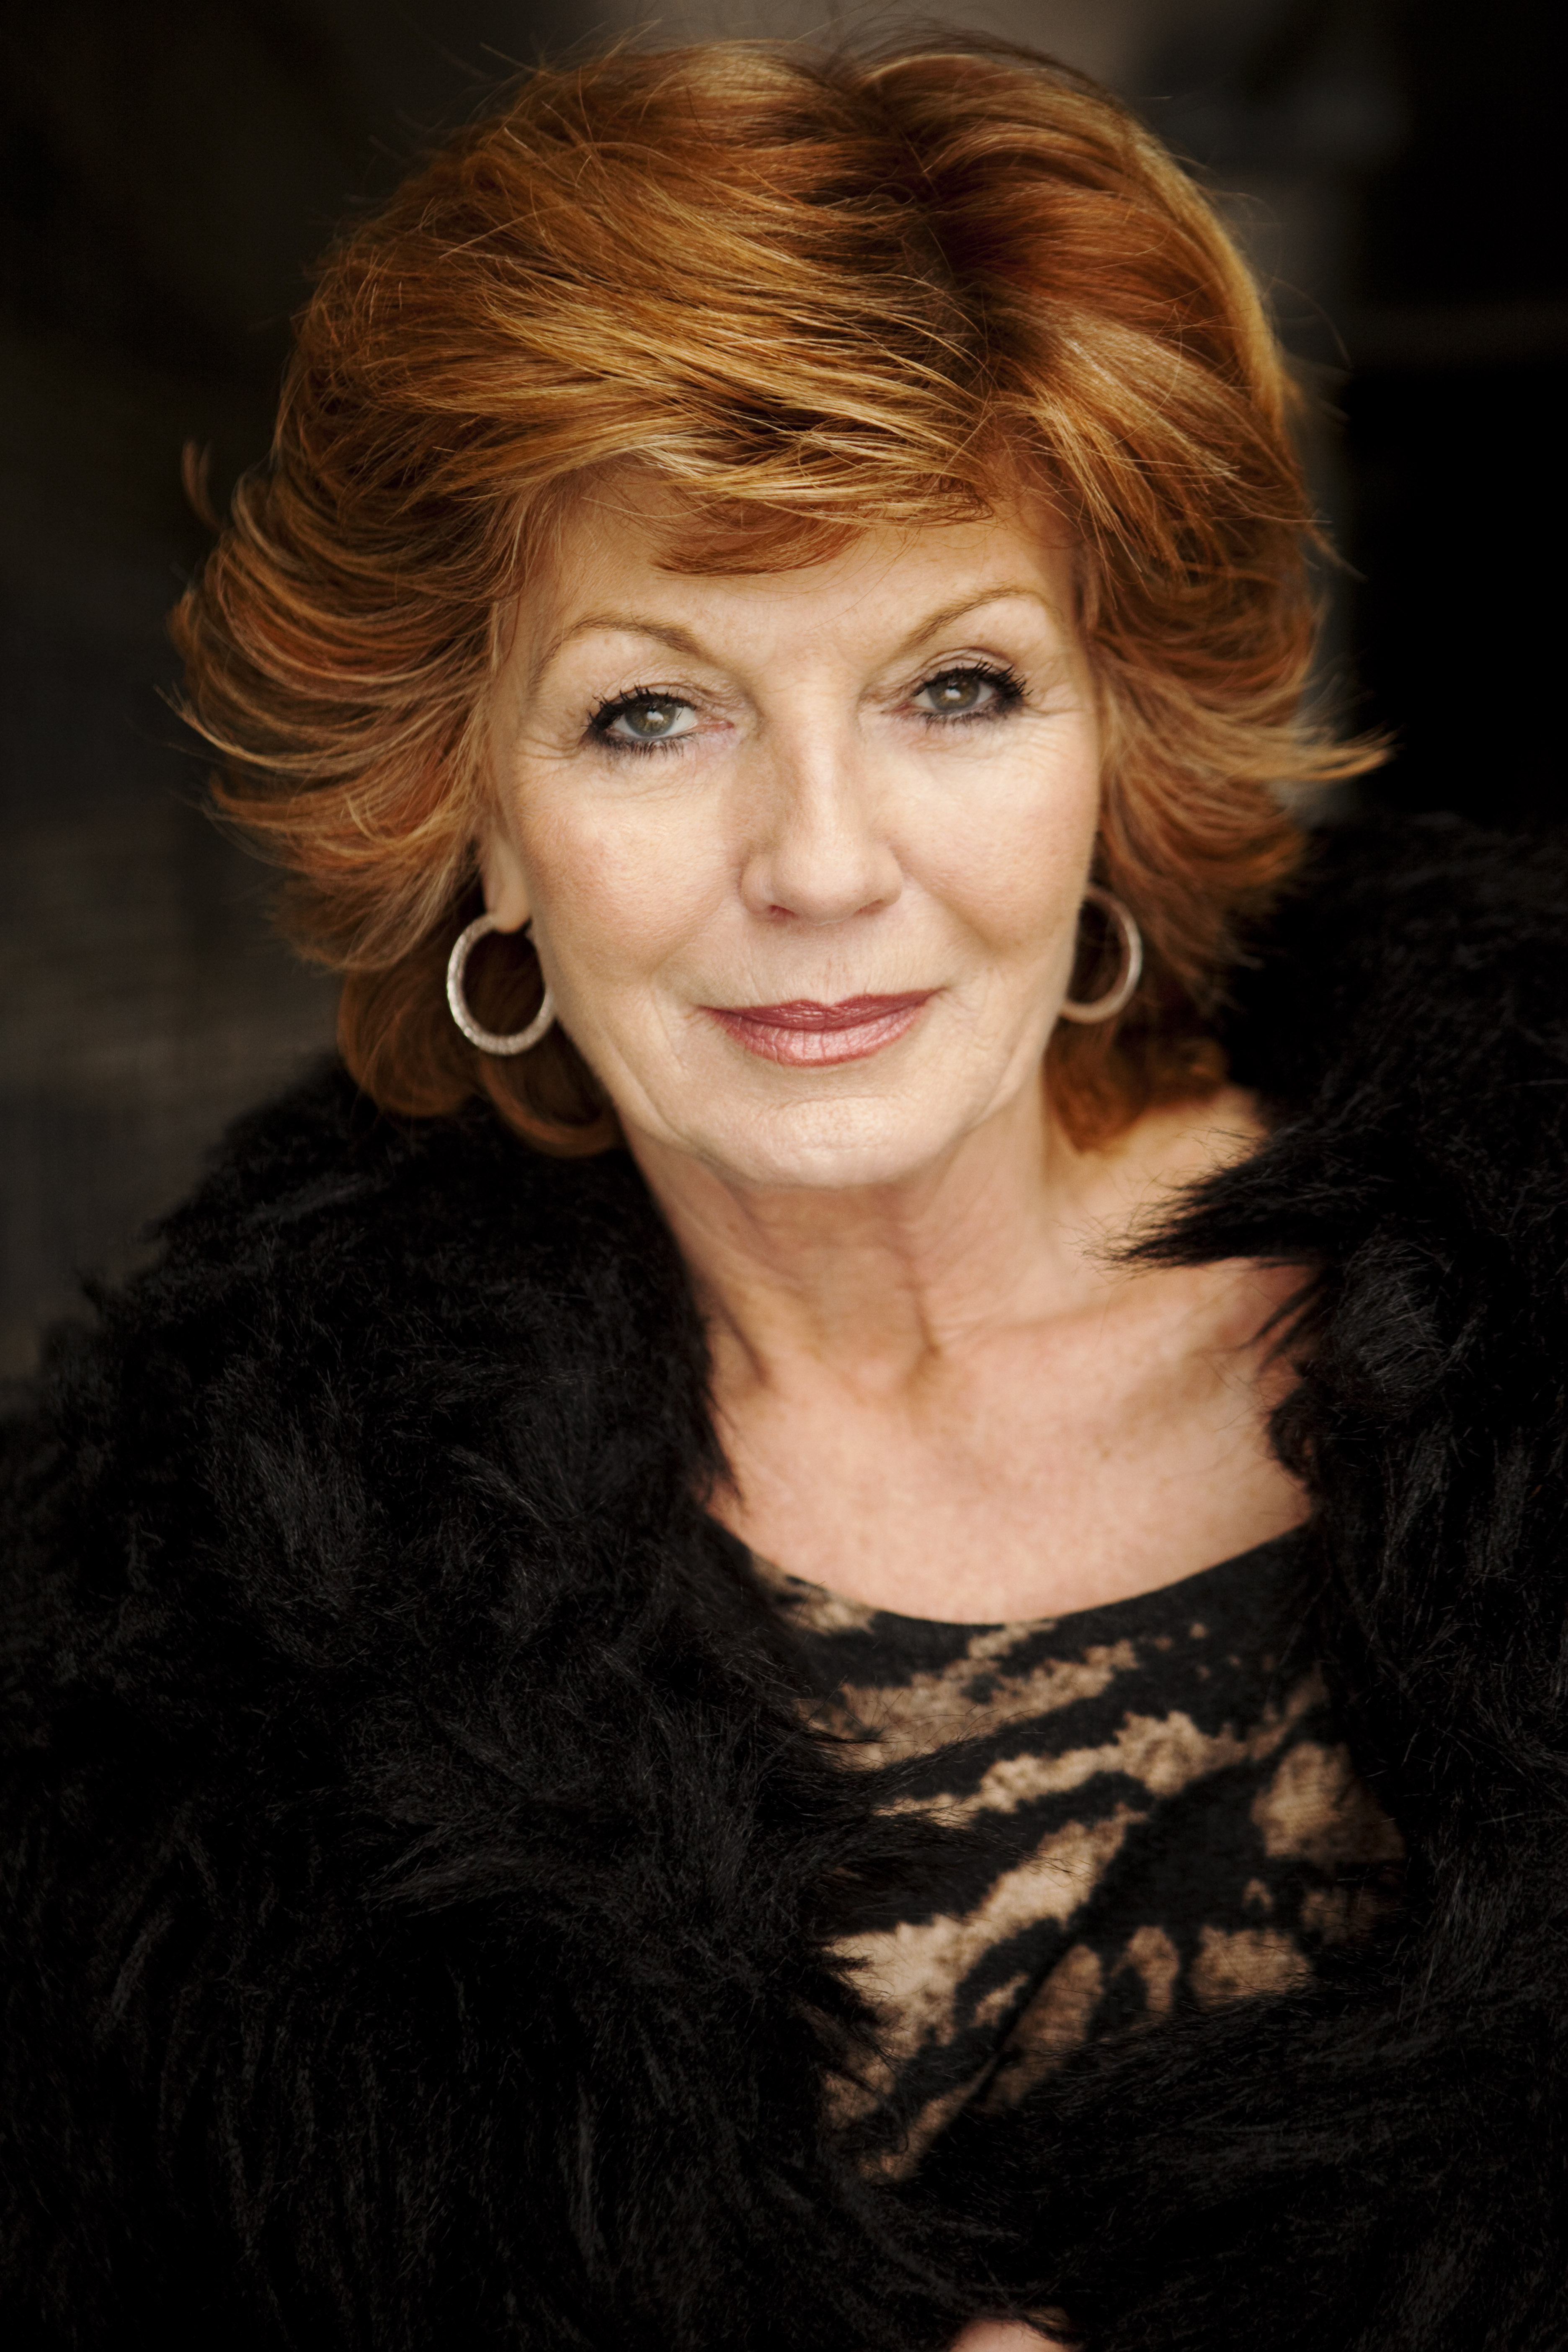 Rula Lenska (born 1947) nude photos 2019